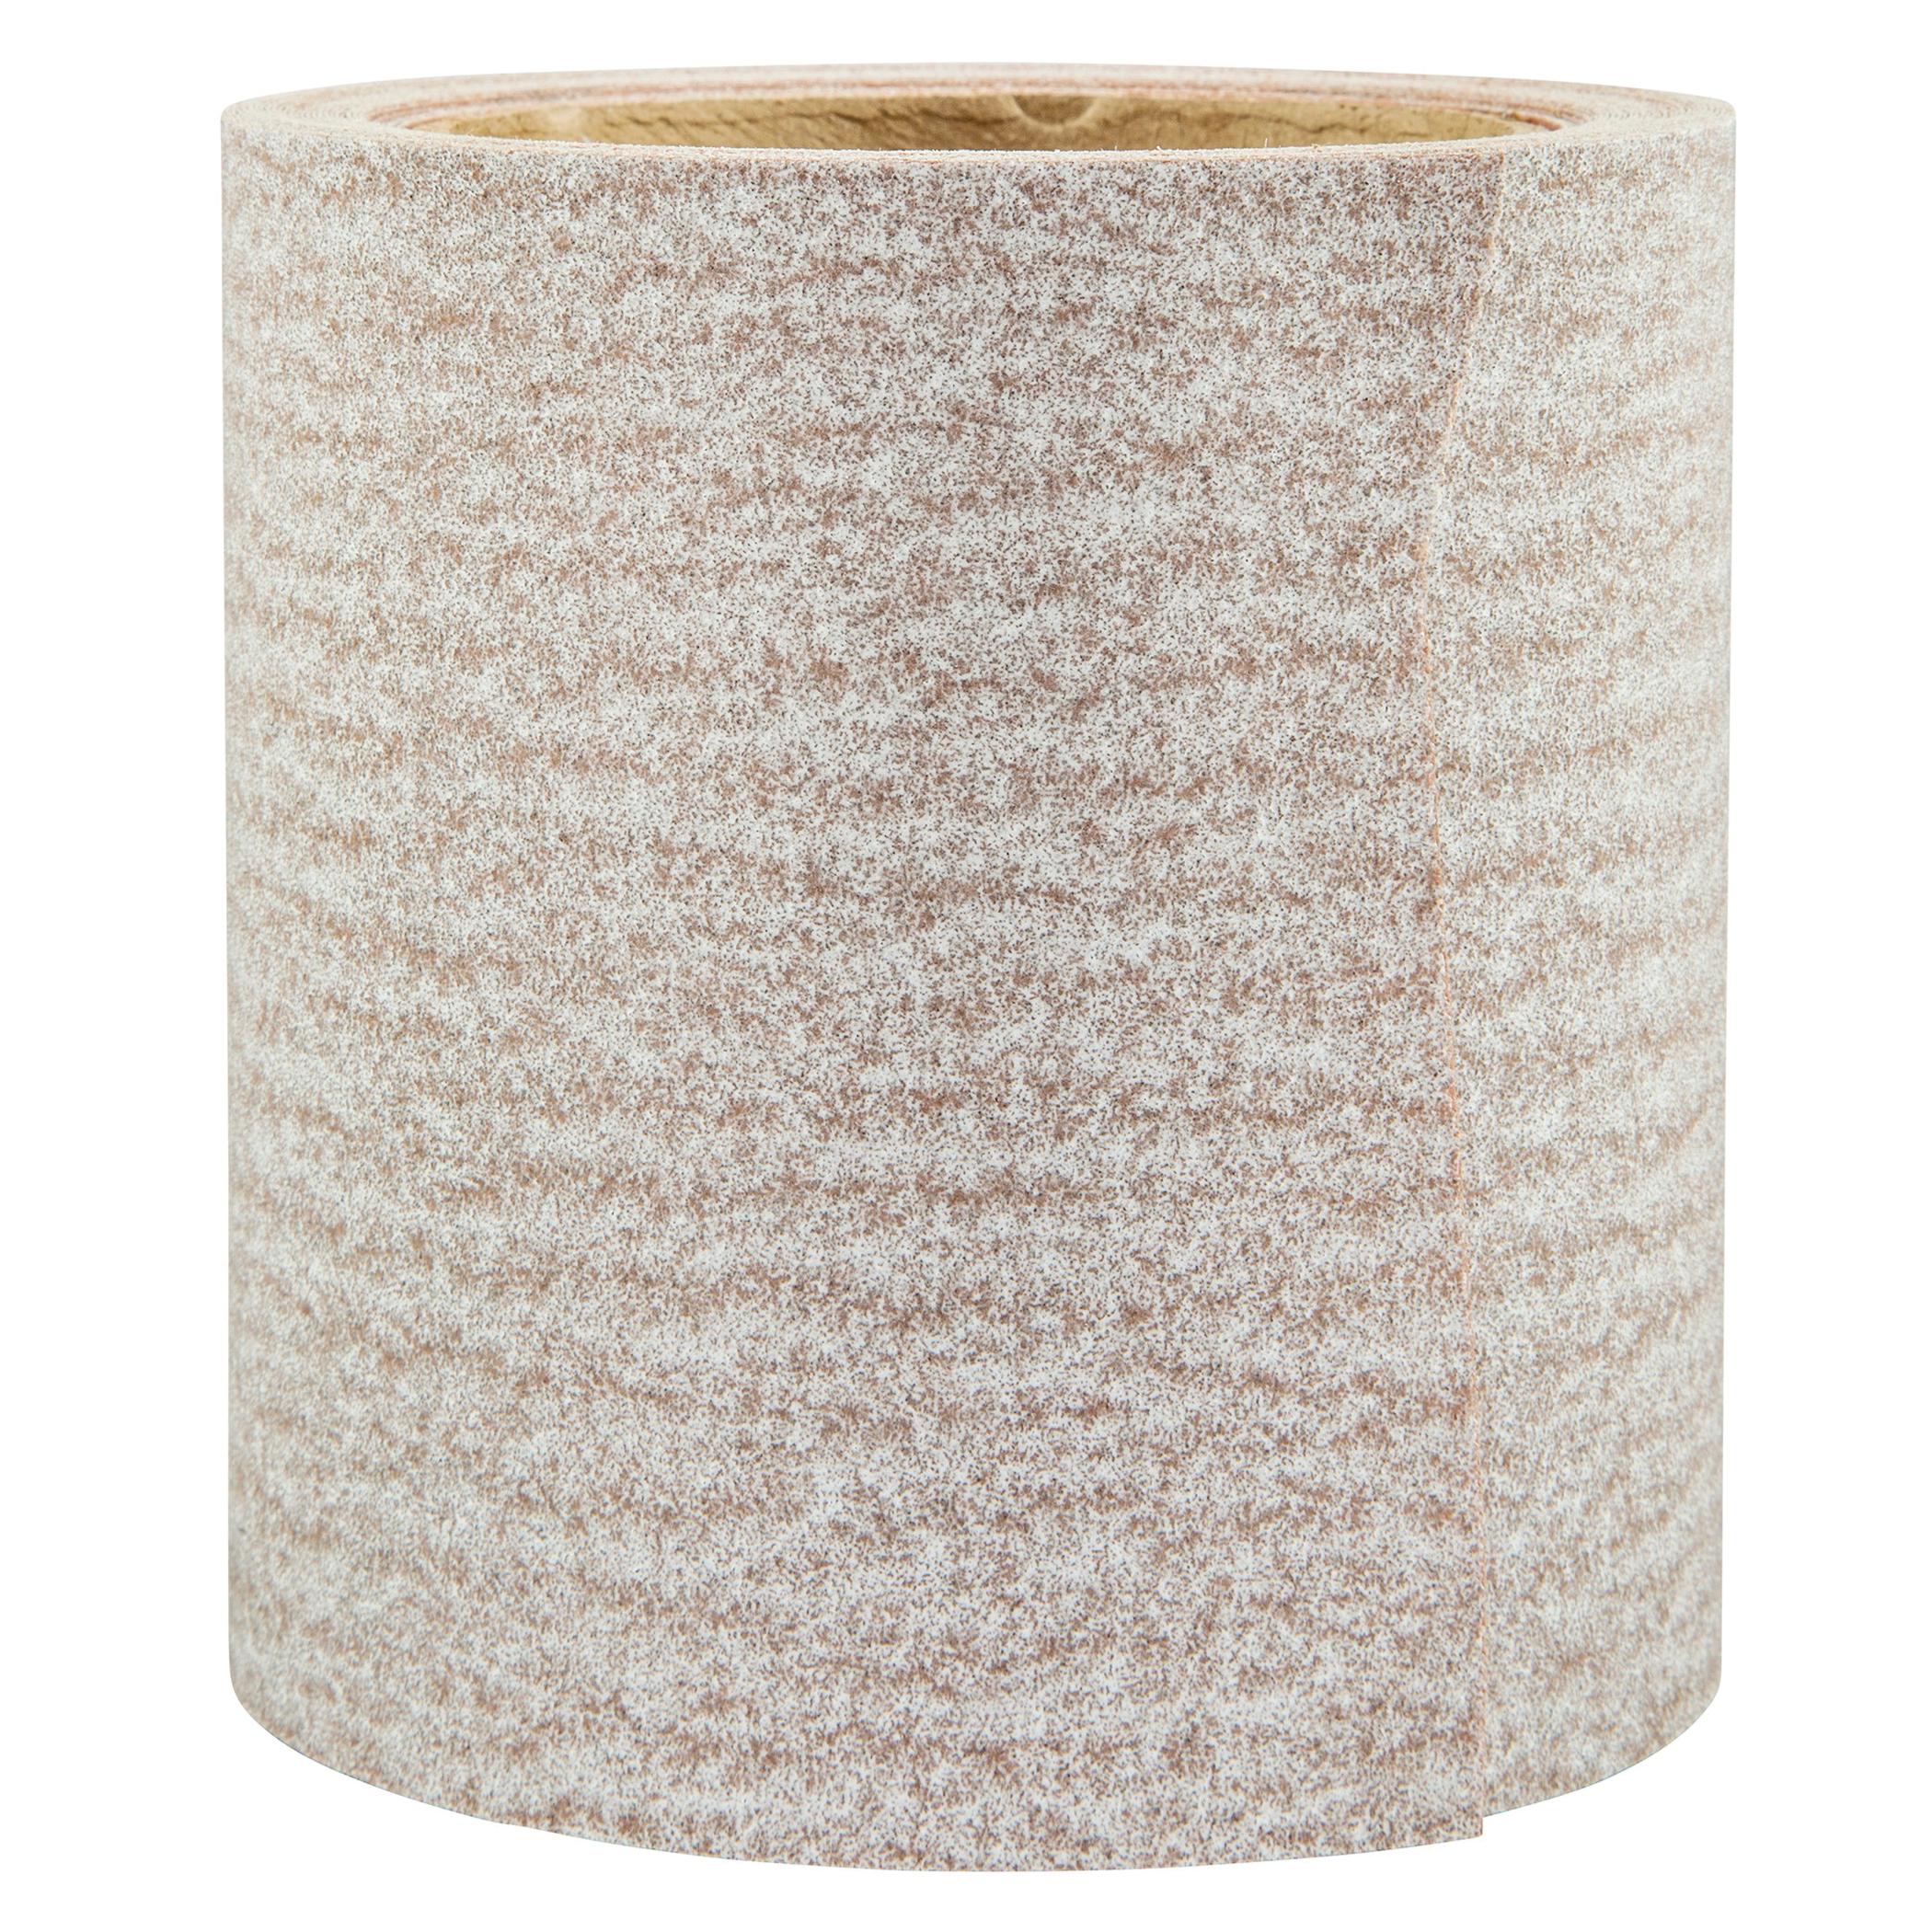 Norton® 66261131695 OP A275 Coated Abrasive Roll, 10 yd L x 4-1/2 in W, 120 Grit, Medium Grade, Aluminum Oxide Abrasive, Anti-Loading Paper Backing